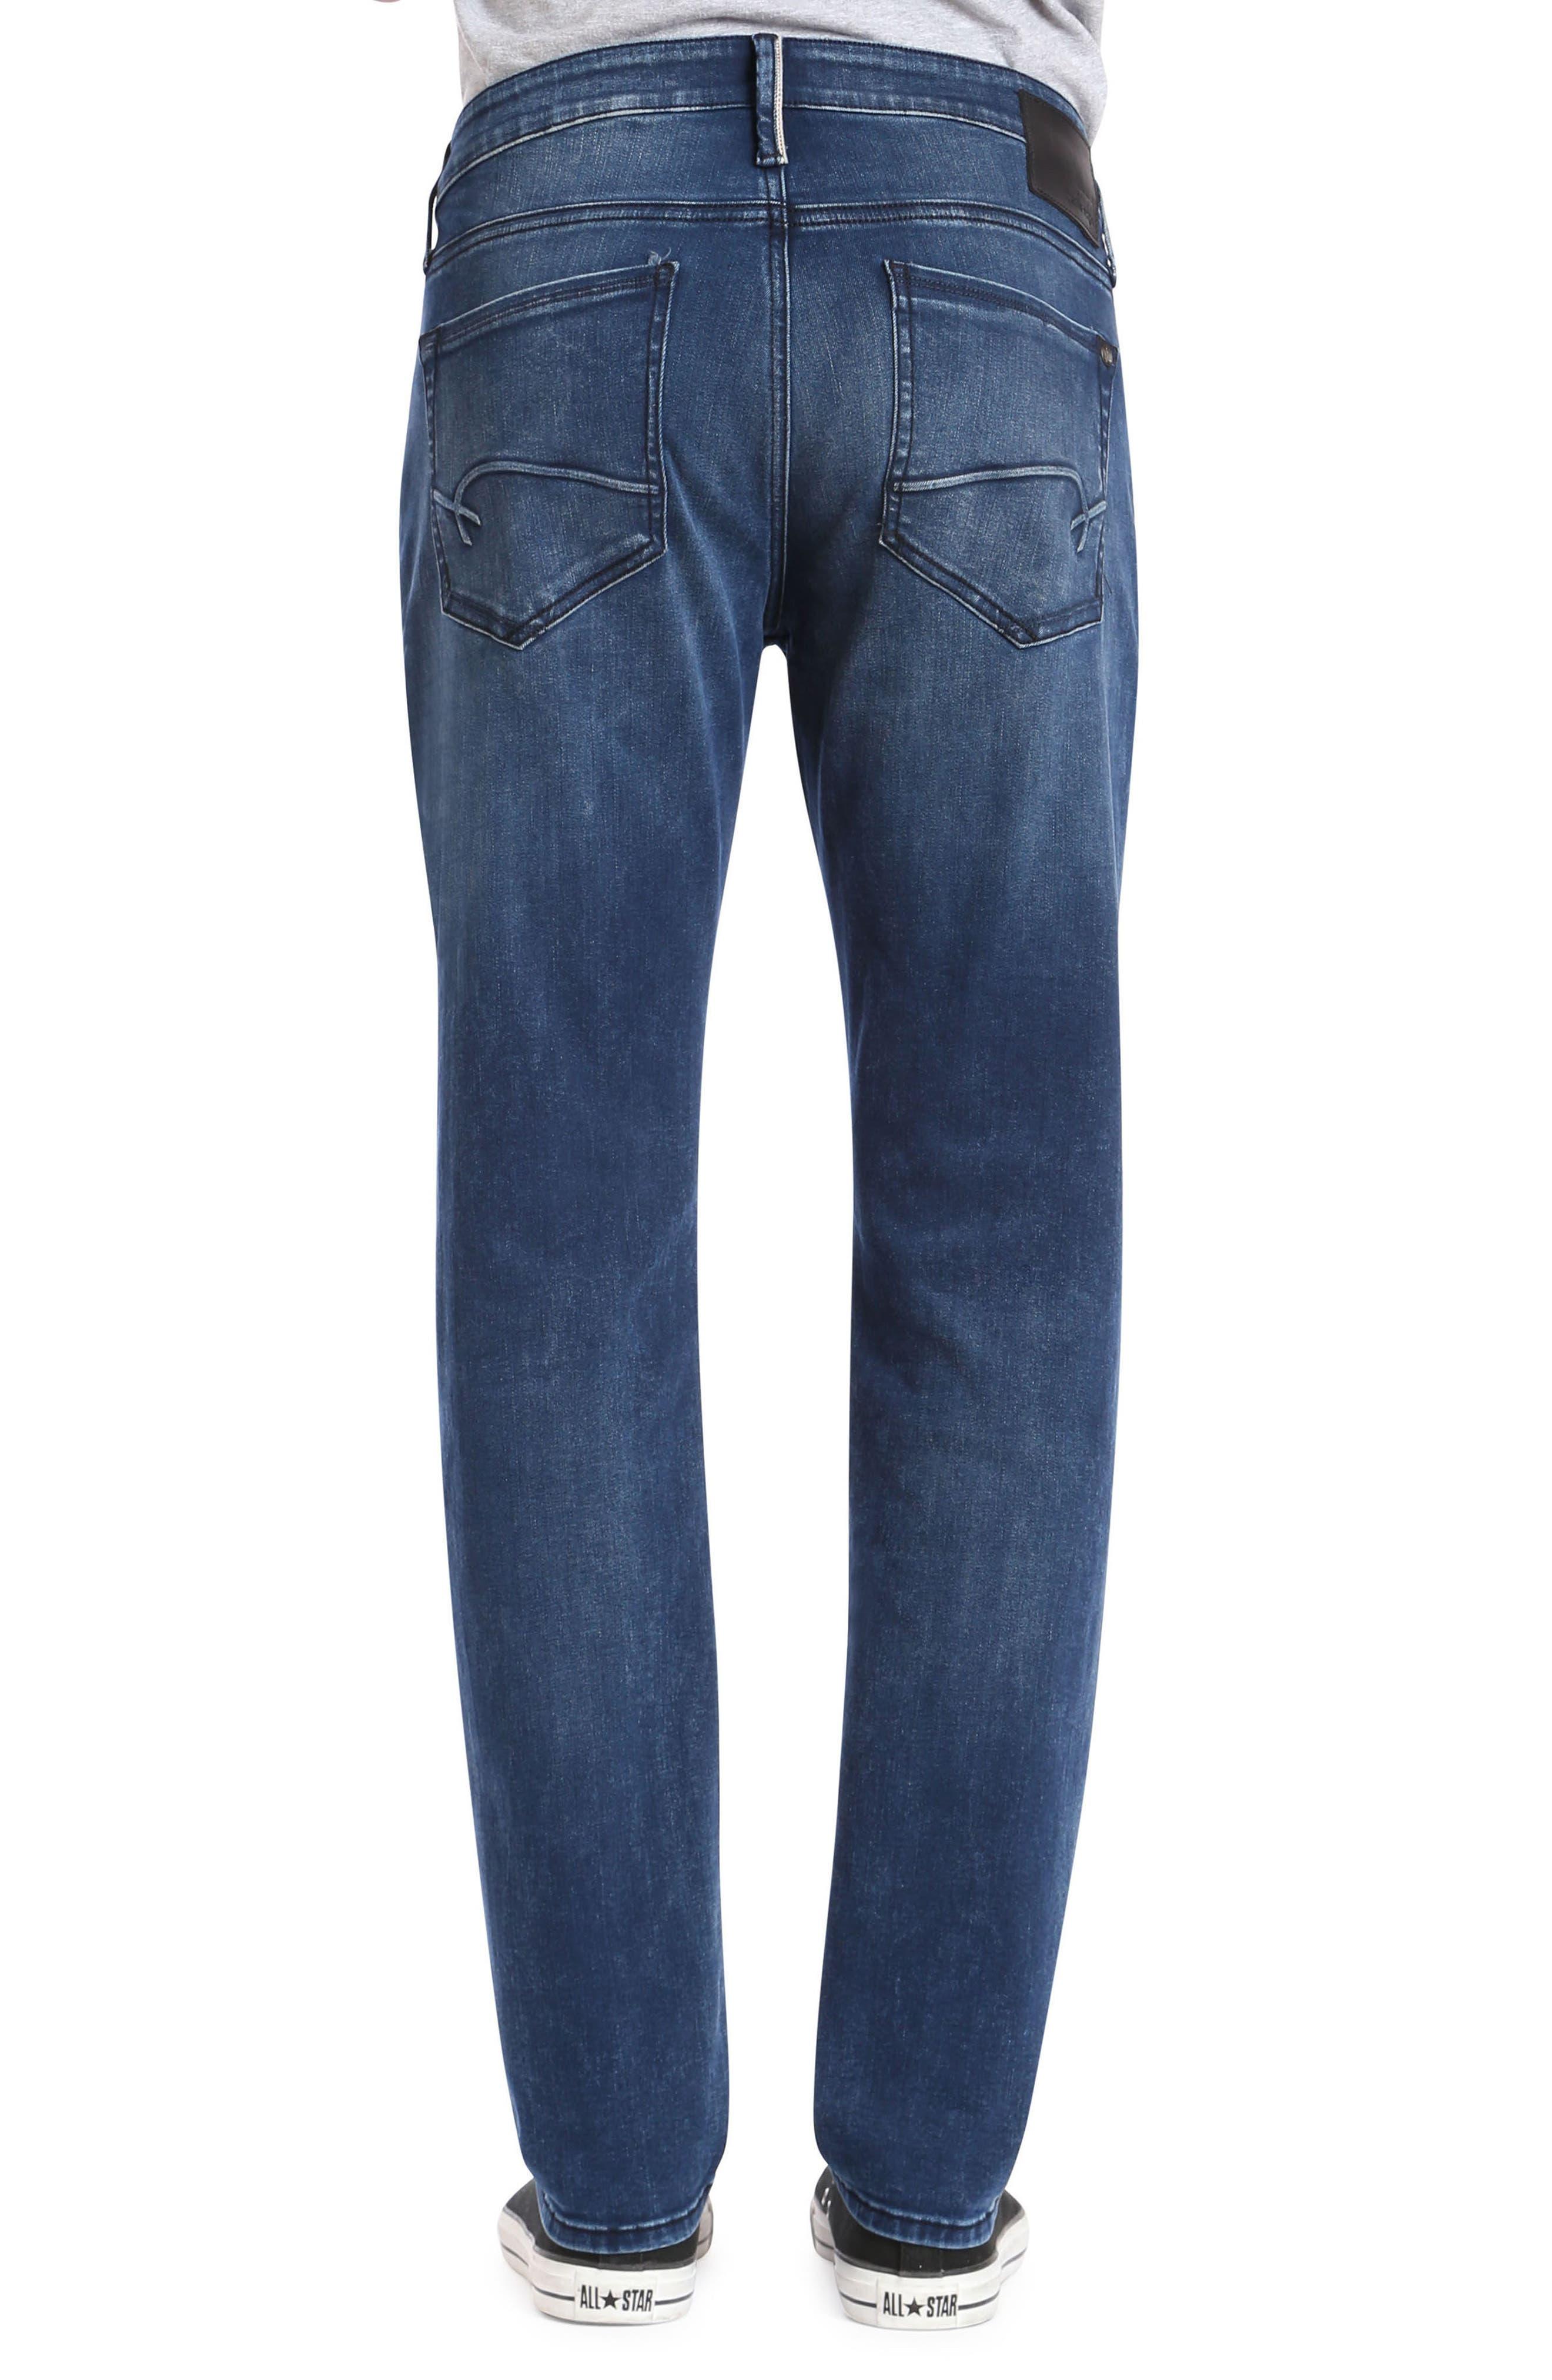 Marcus Slim Straight Leg Jeans,                             Alternate thumbnail 2, color,                             400